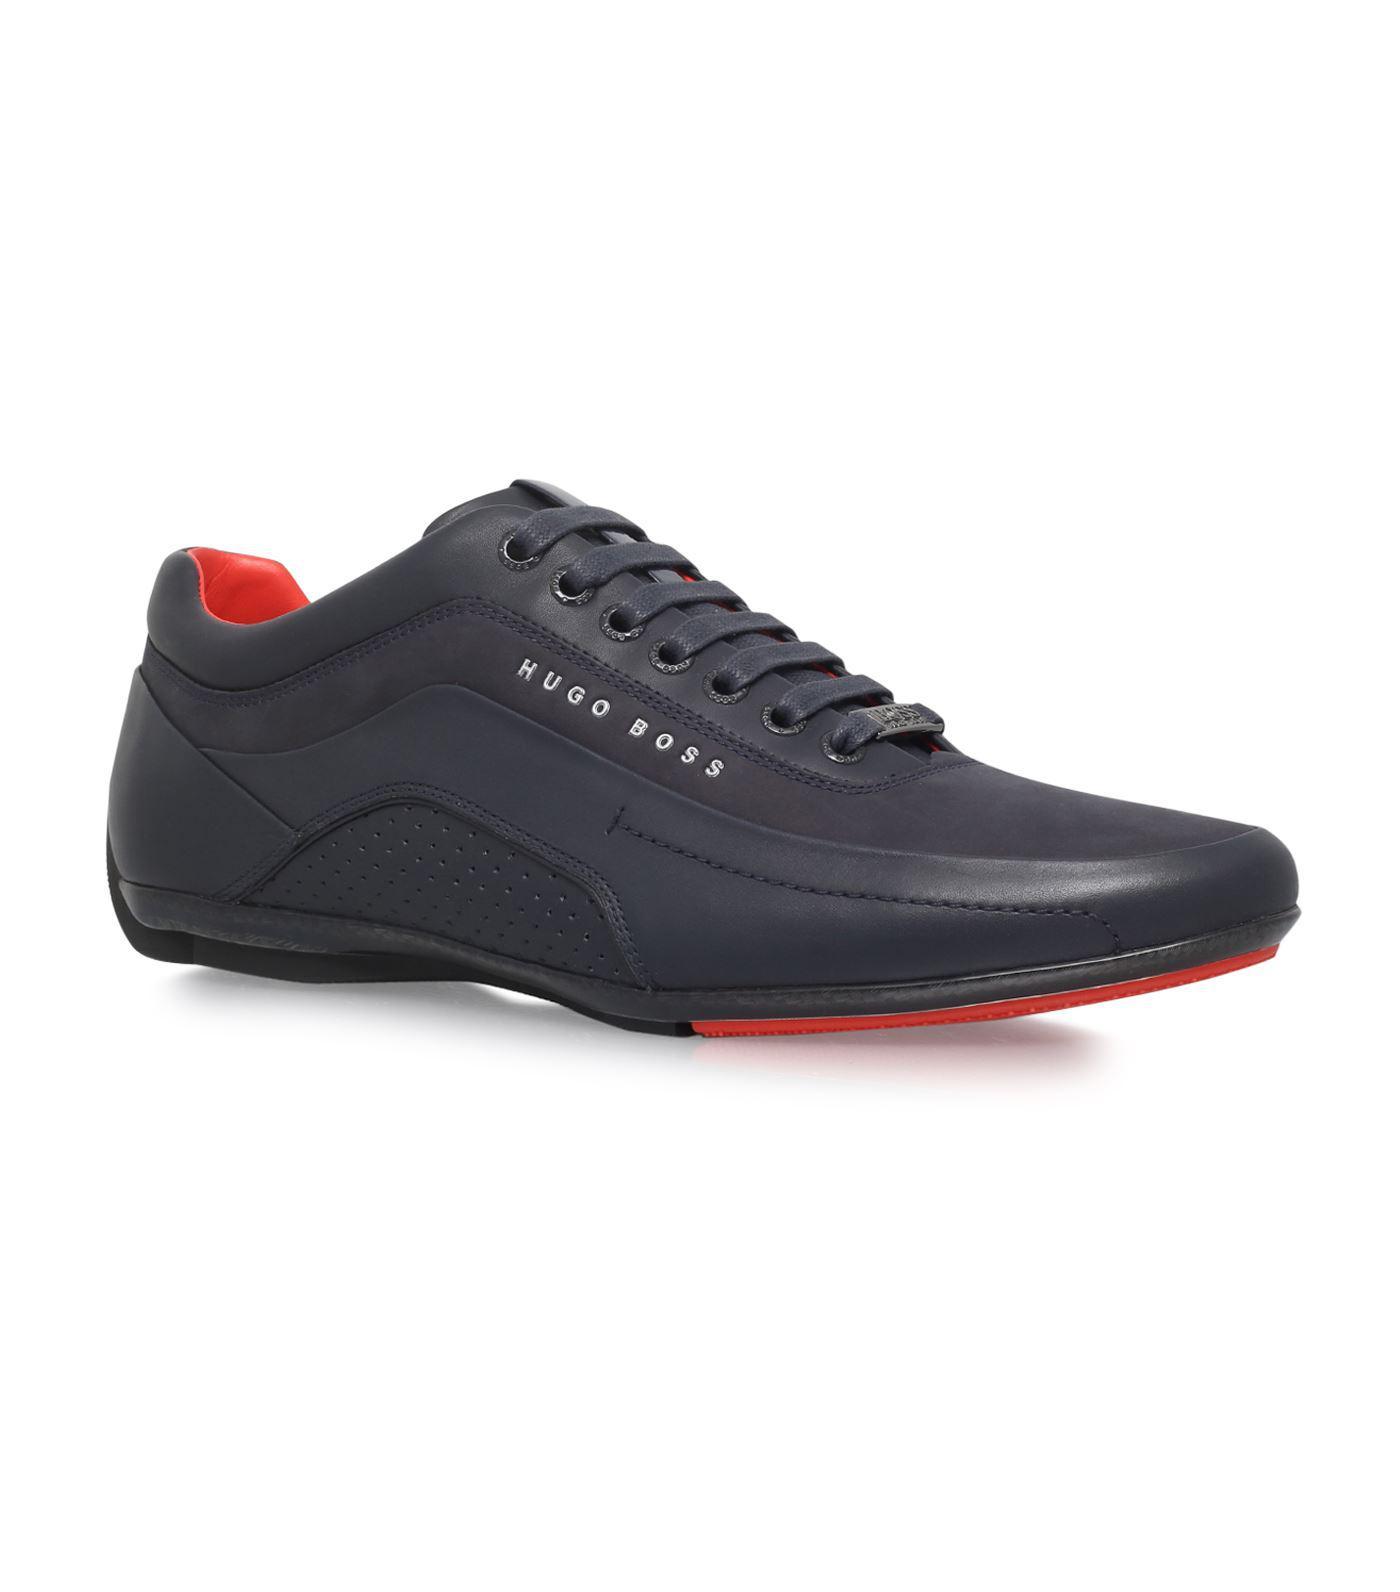 Hugo Boss Leather Racing Sneakers